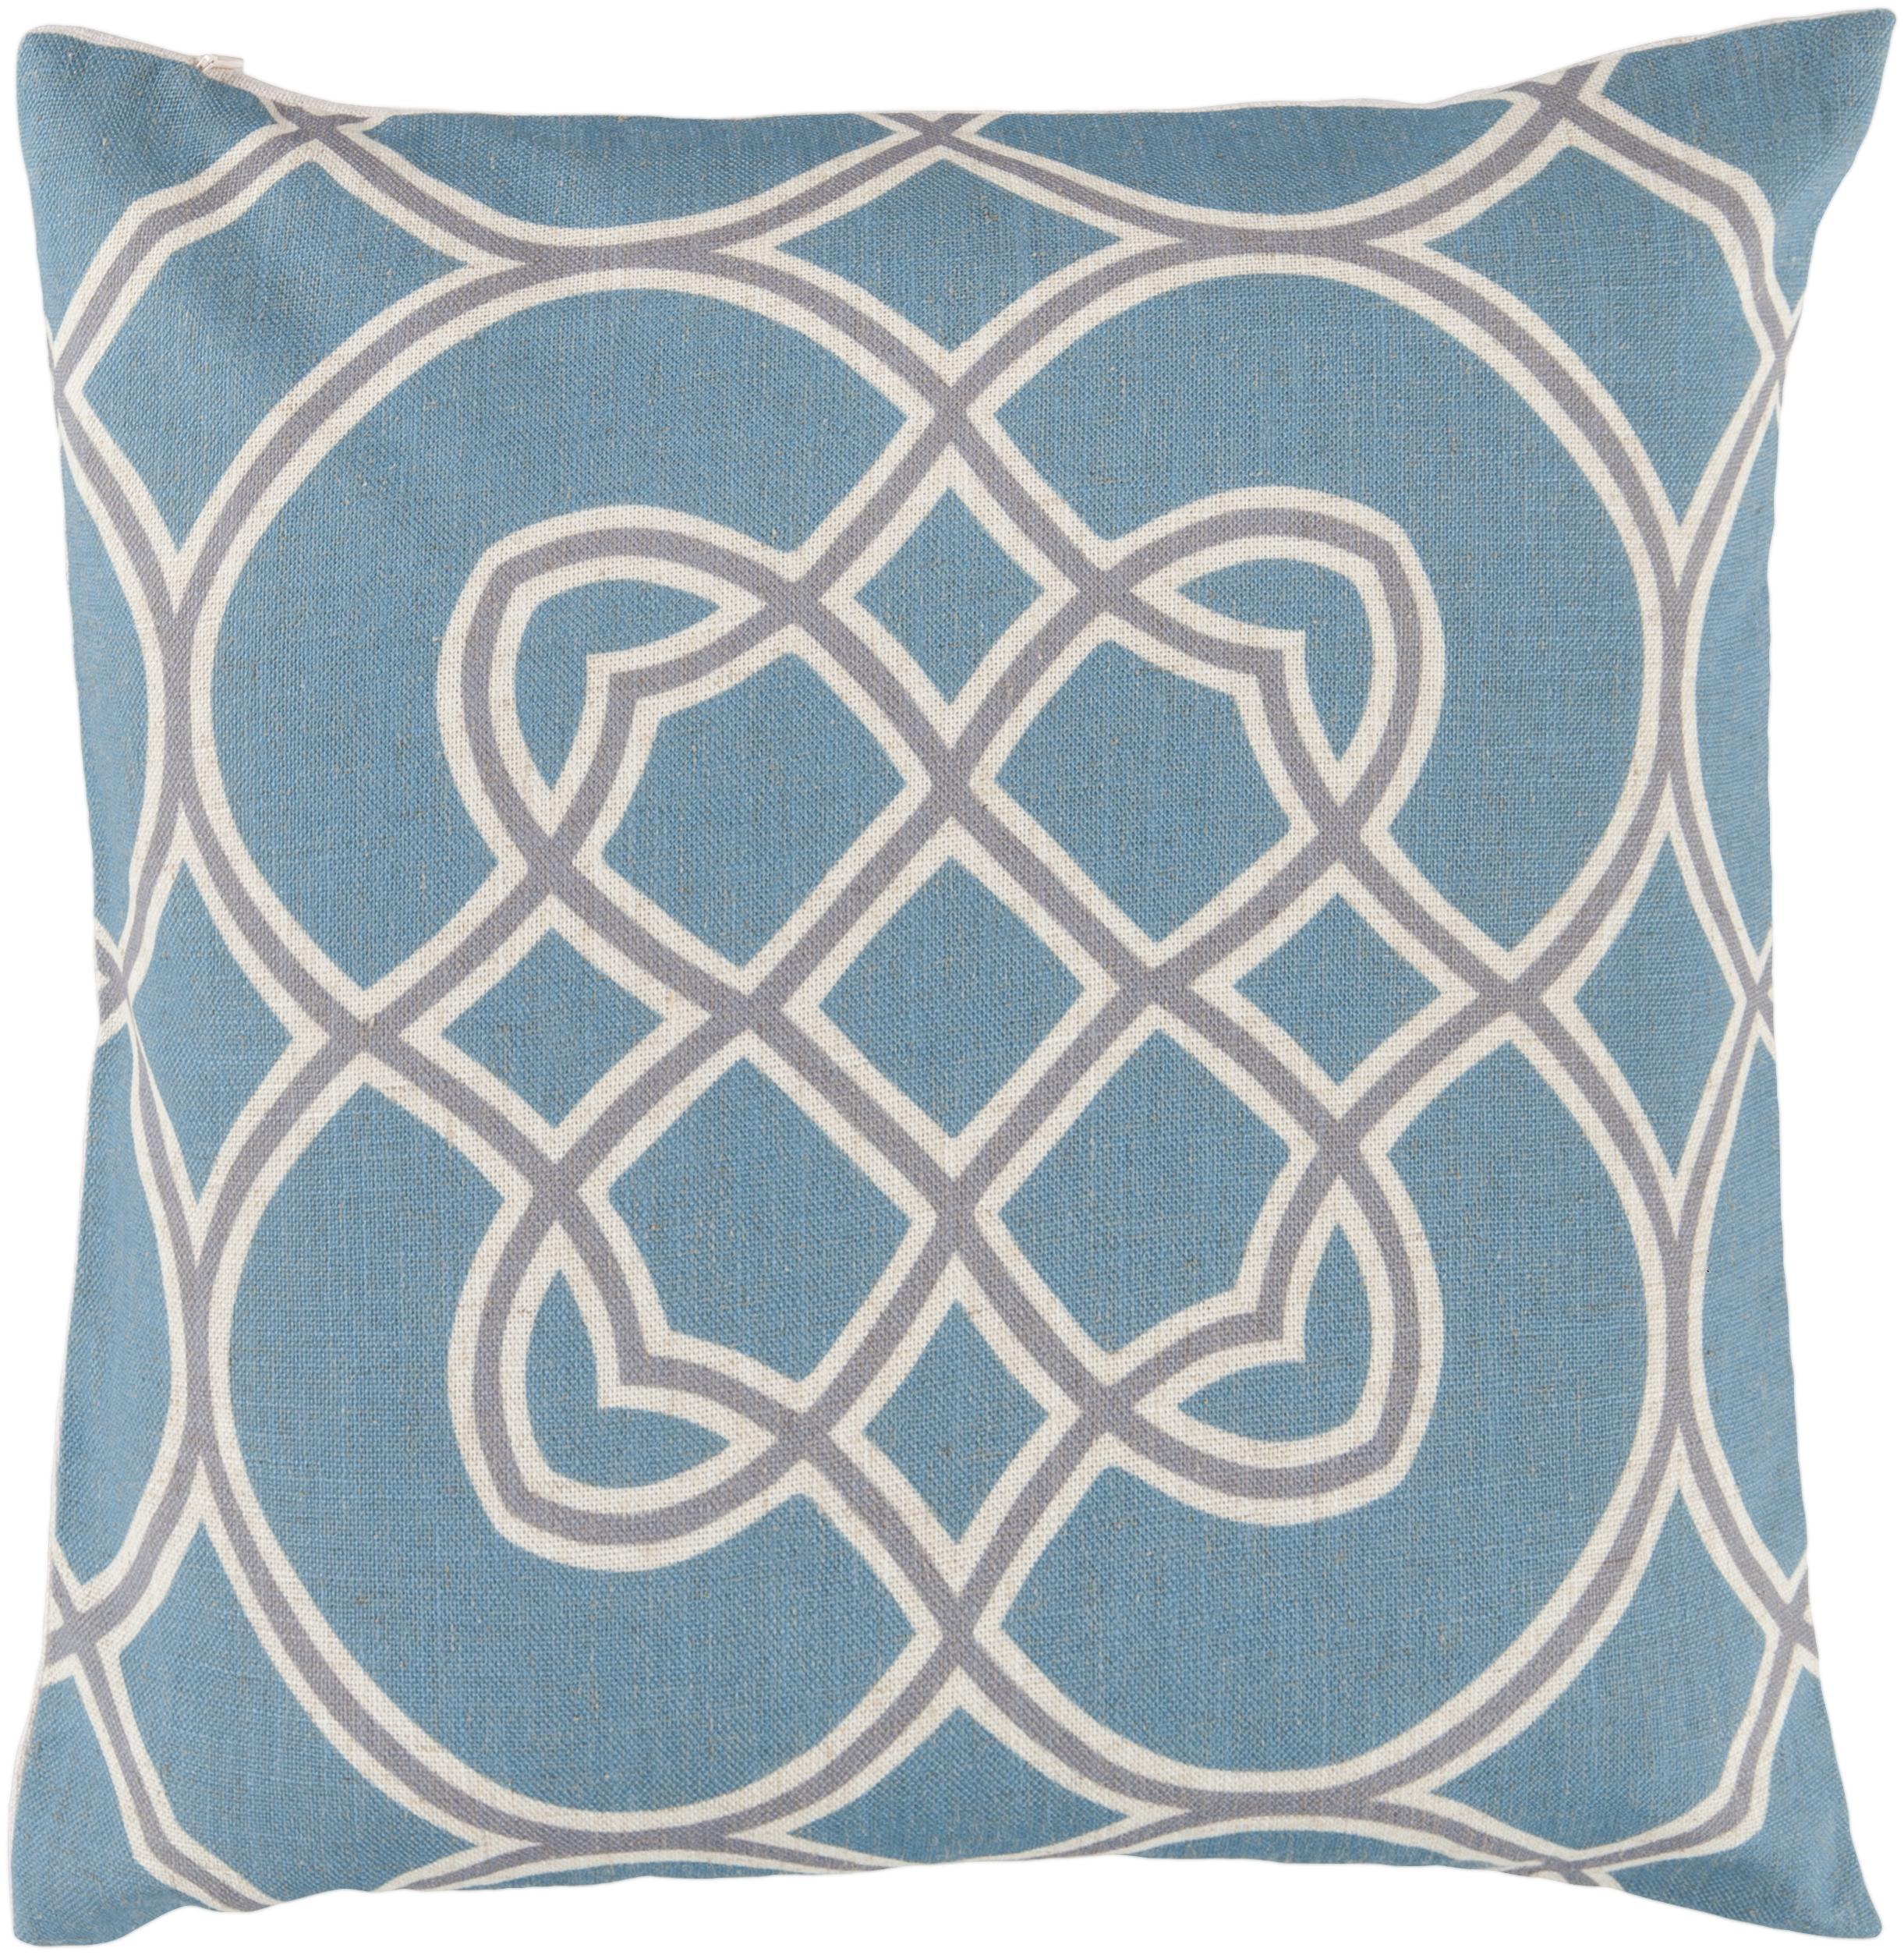 "Surya Rugs Pillows 22"" x 22"" Pillow - Item Number: FF005-2222P"